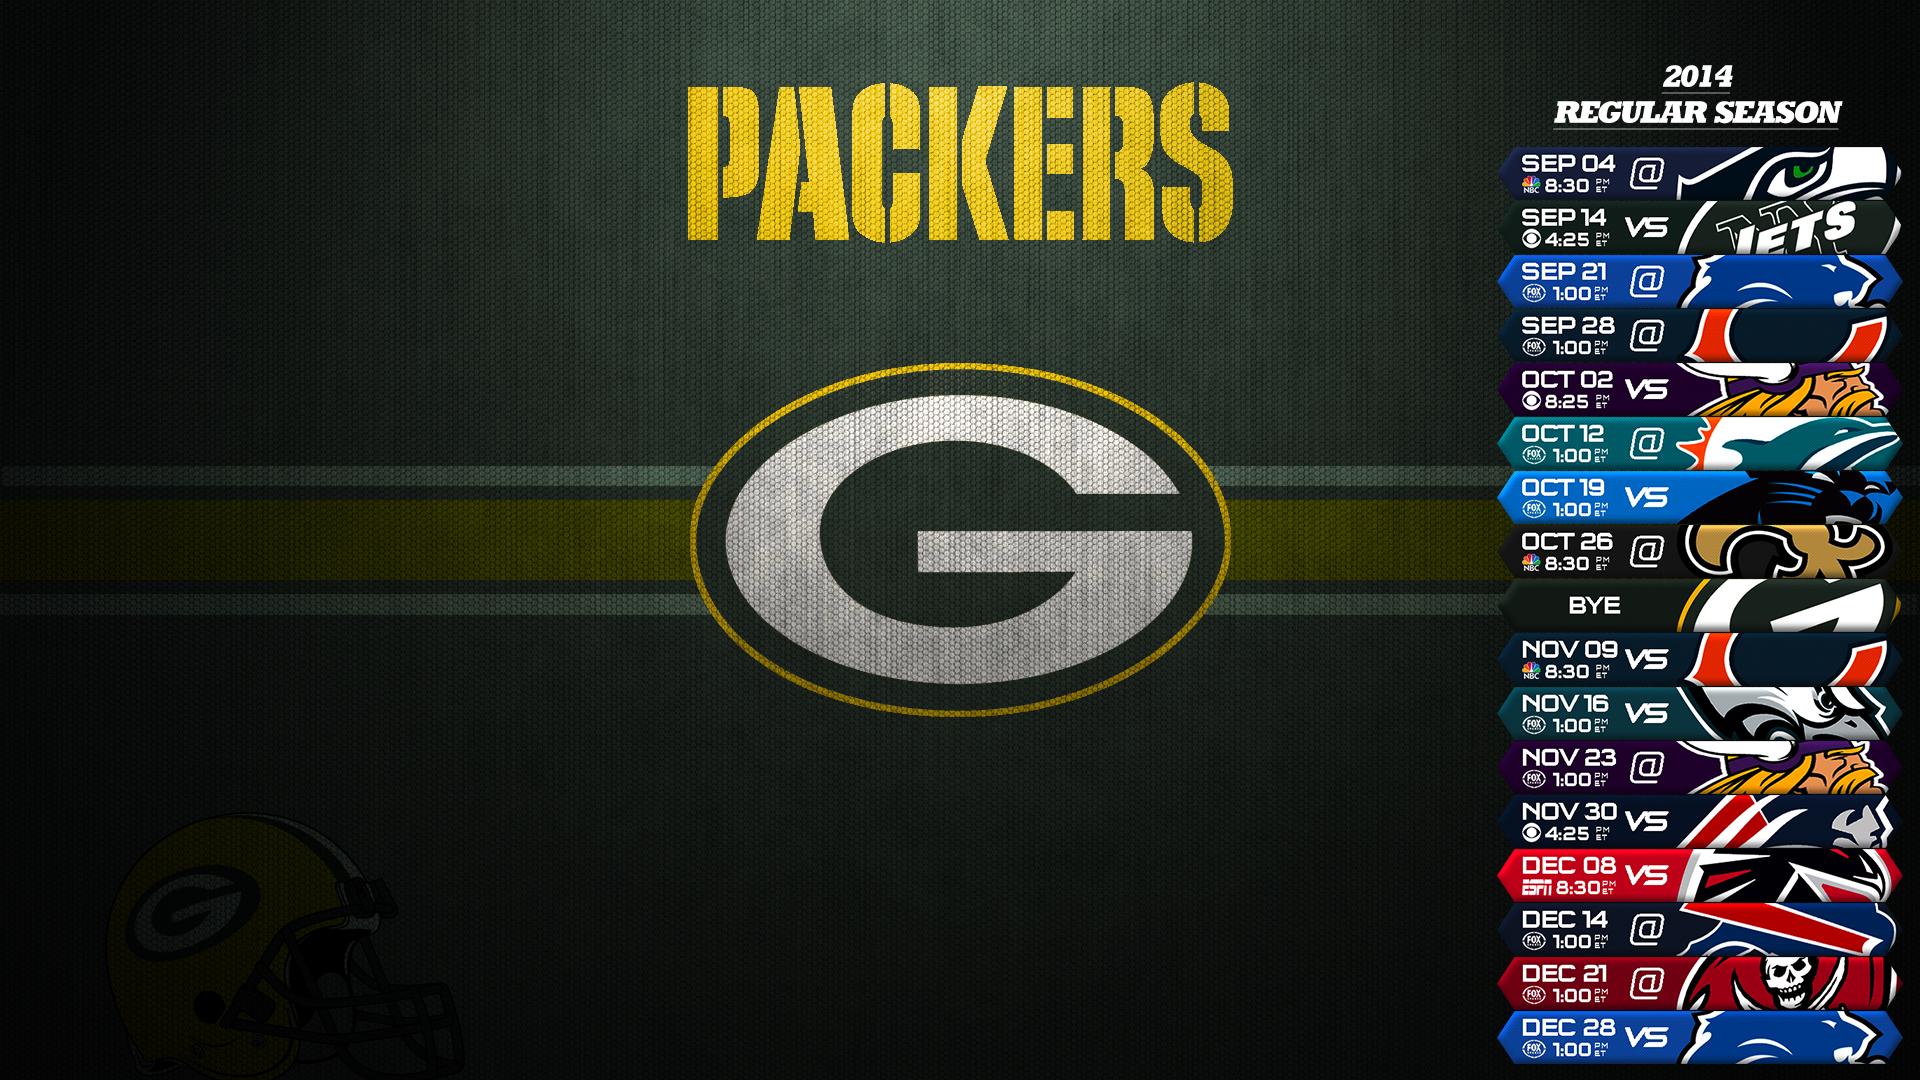 Packers 2015 Schedule Wallpaper Wallpapersafari